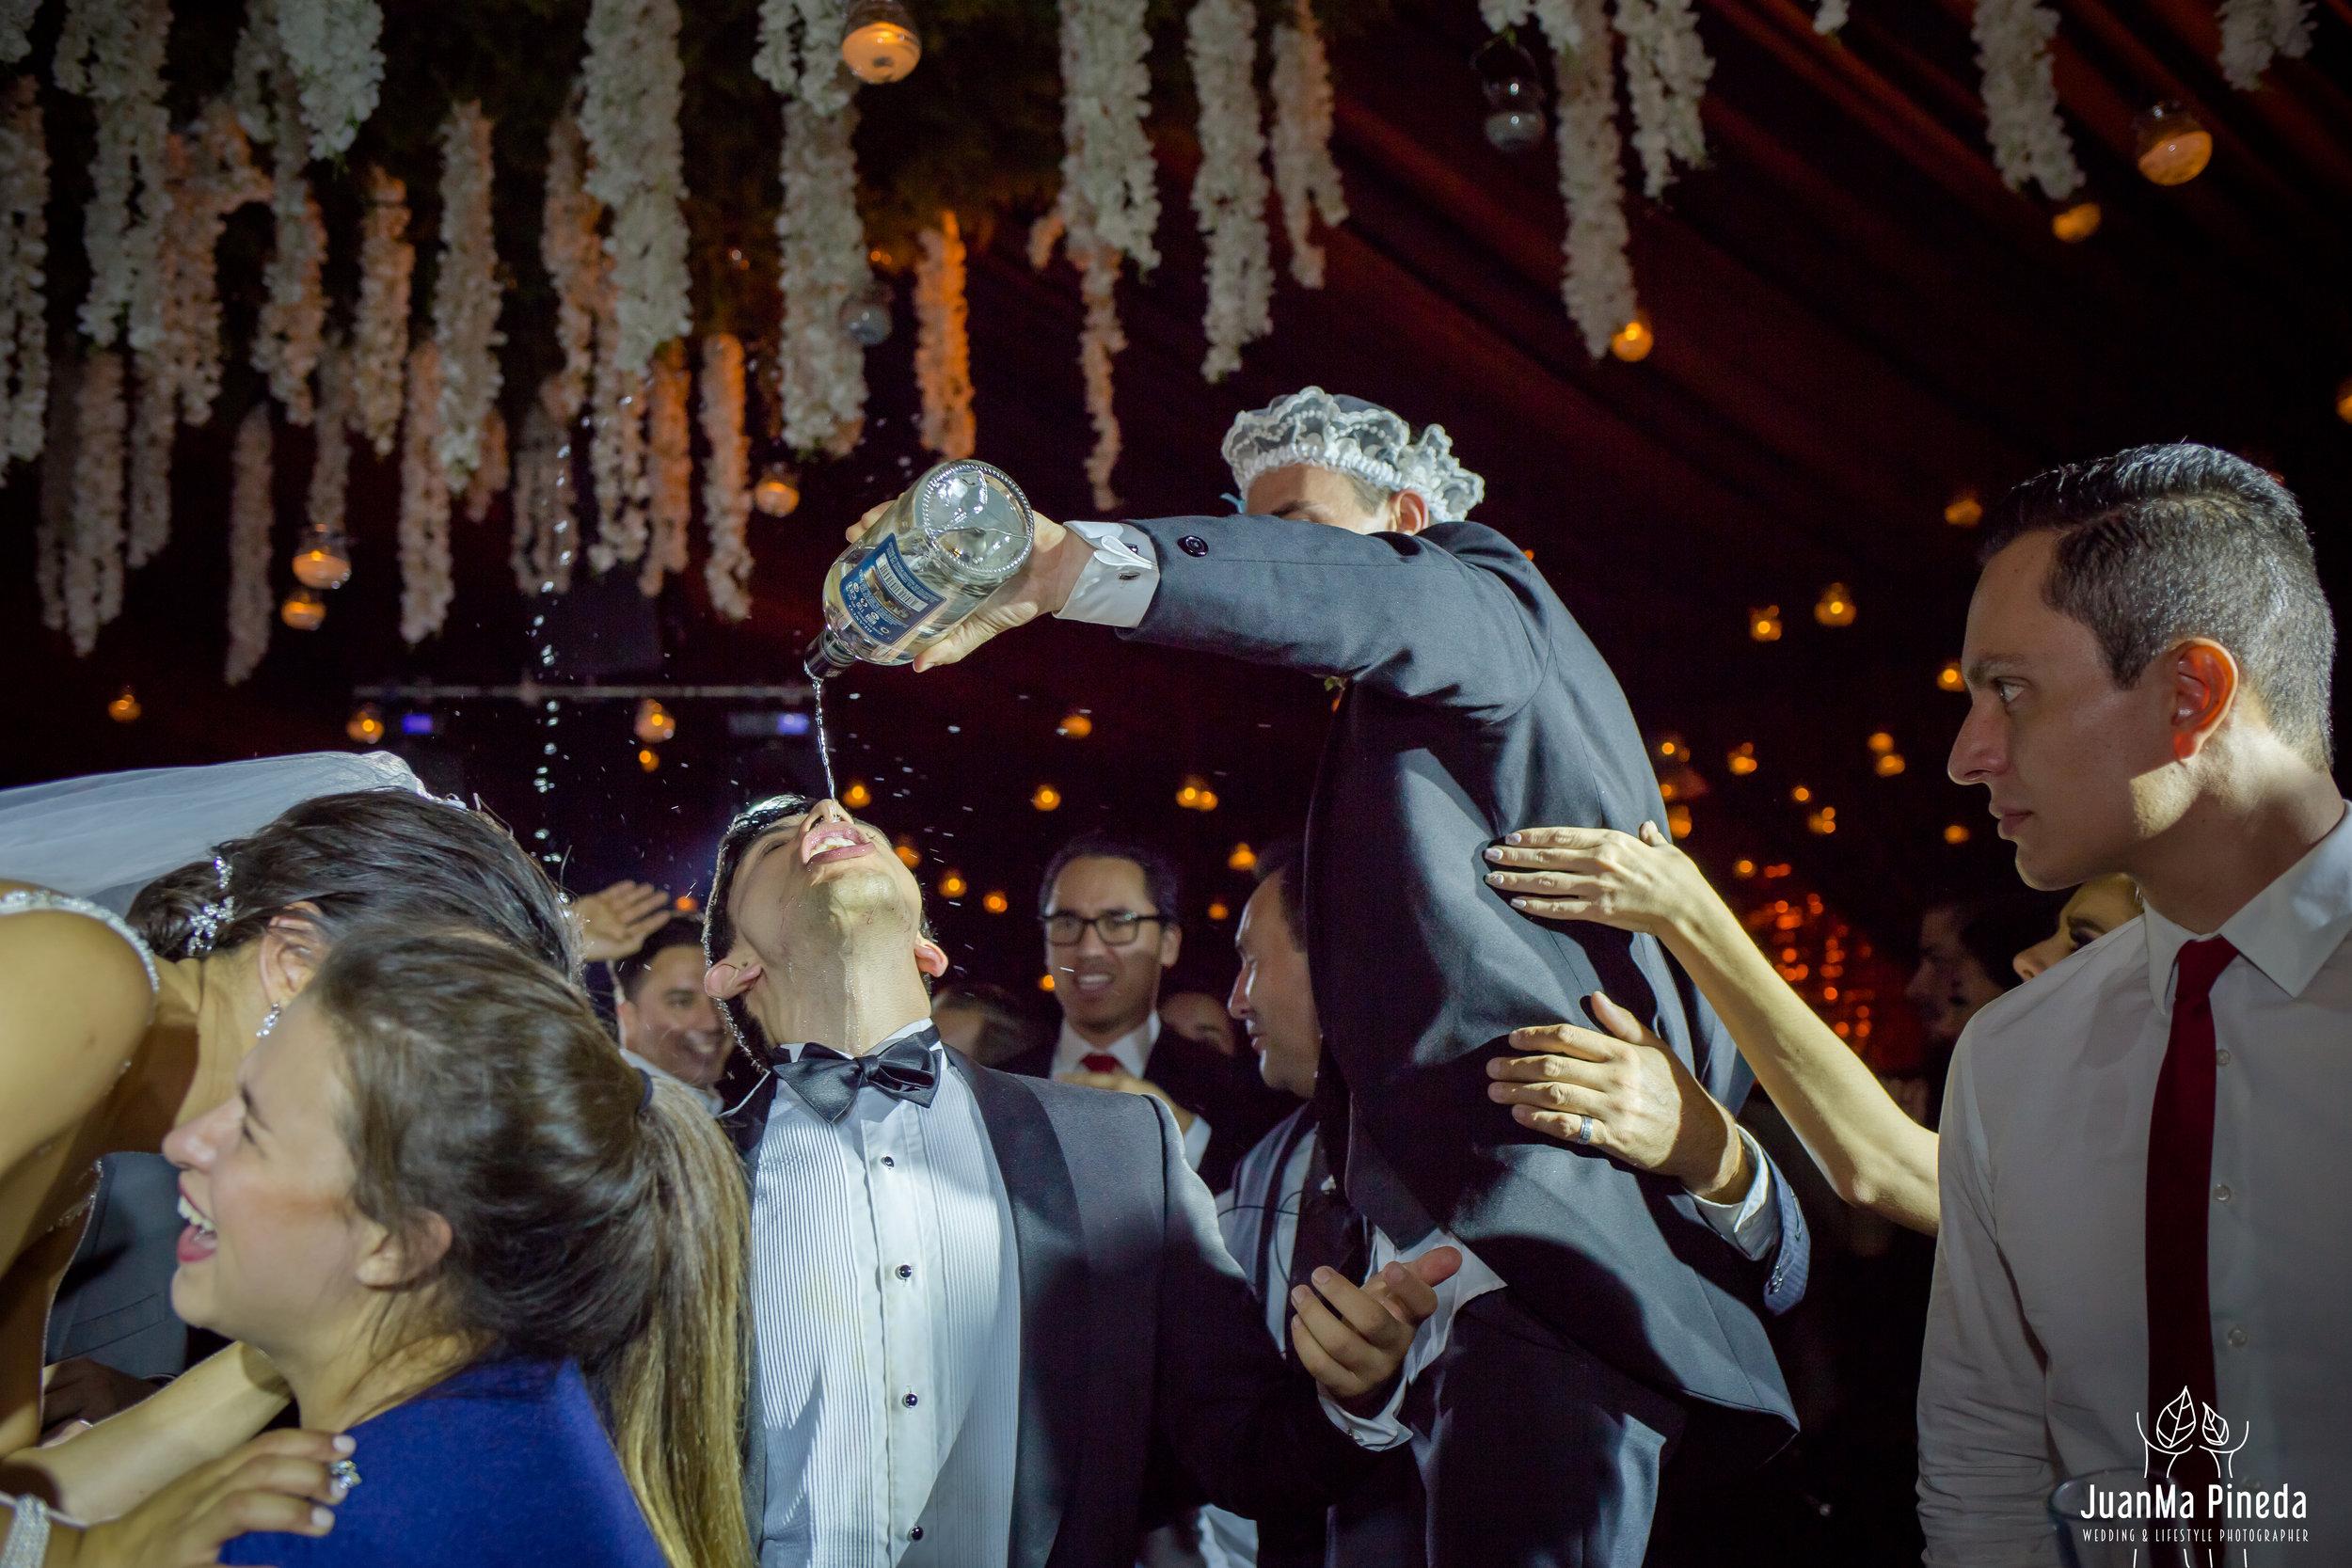 Wedding+Day+Photographer-1-15.jpg